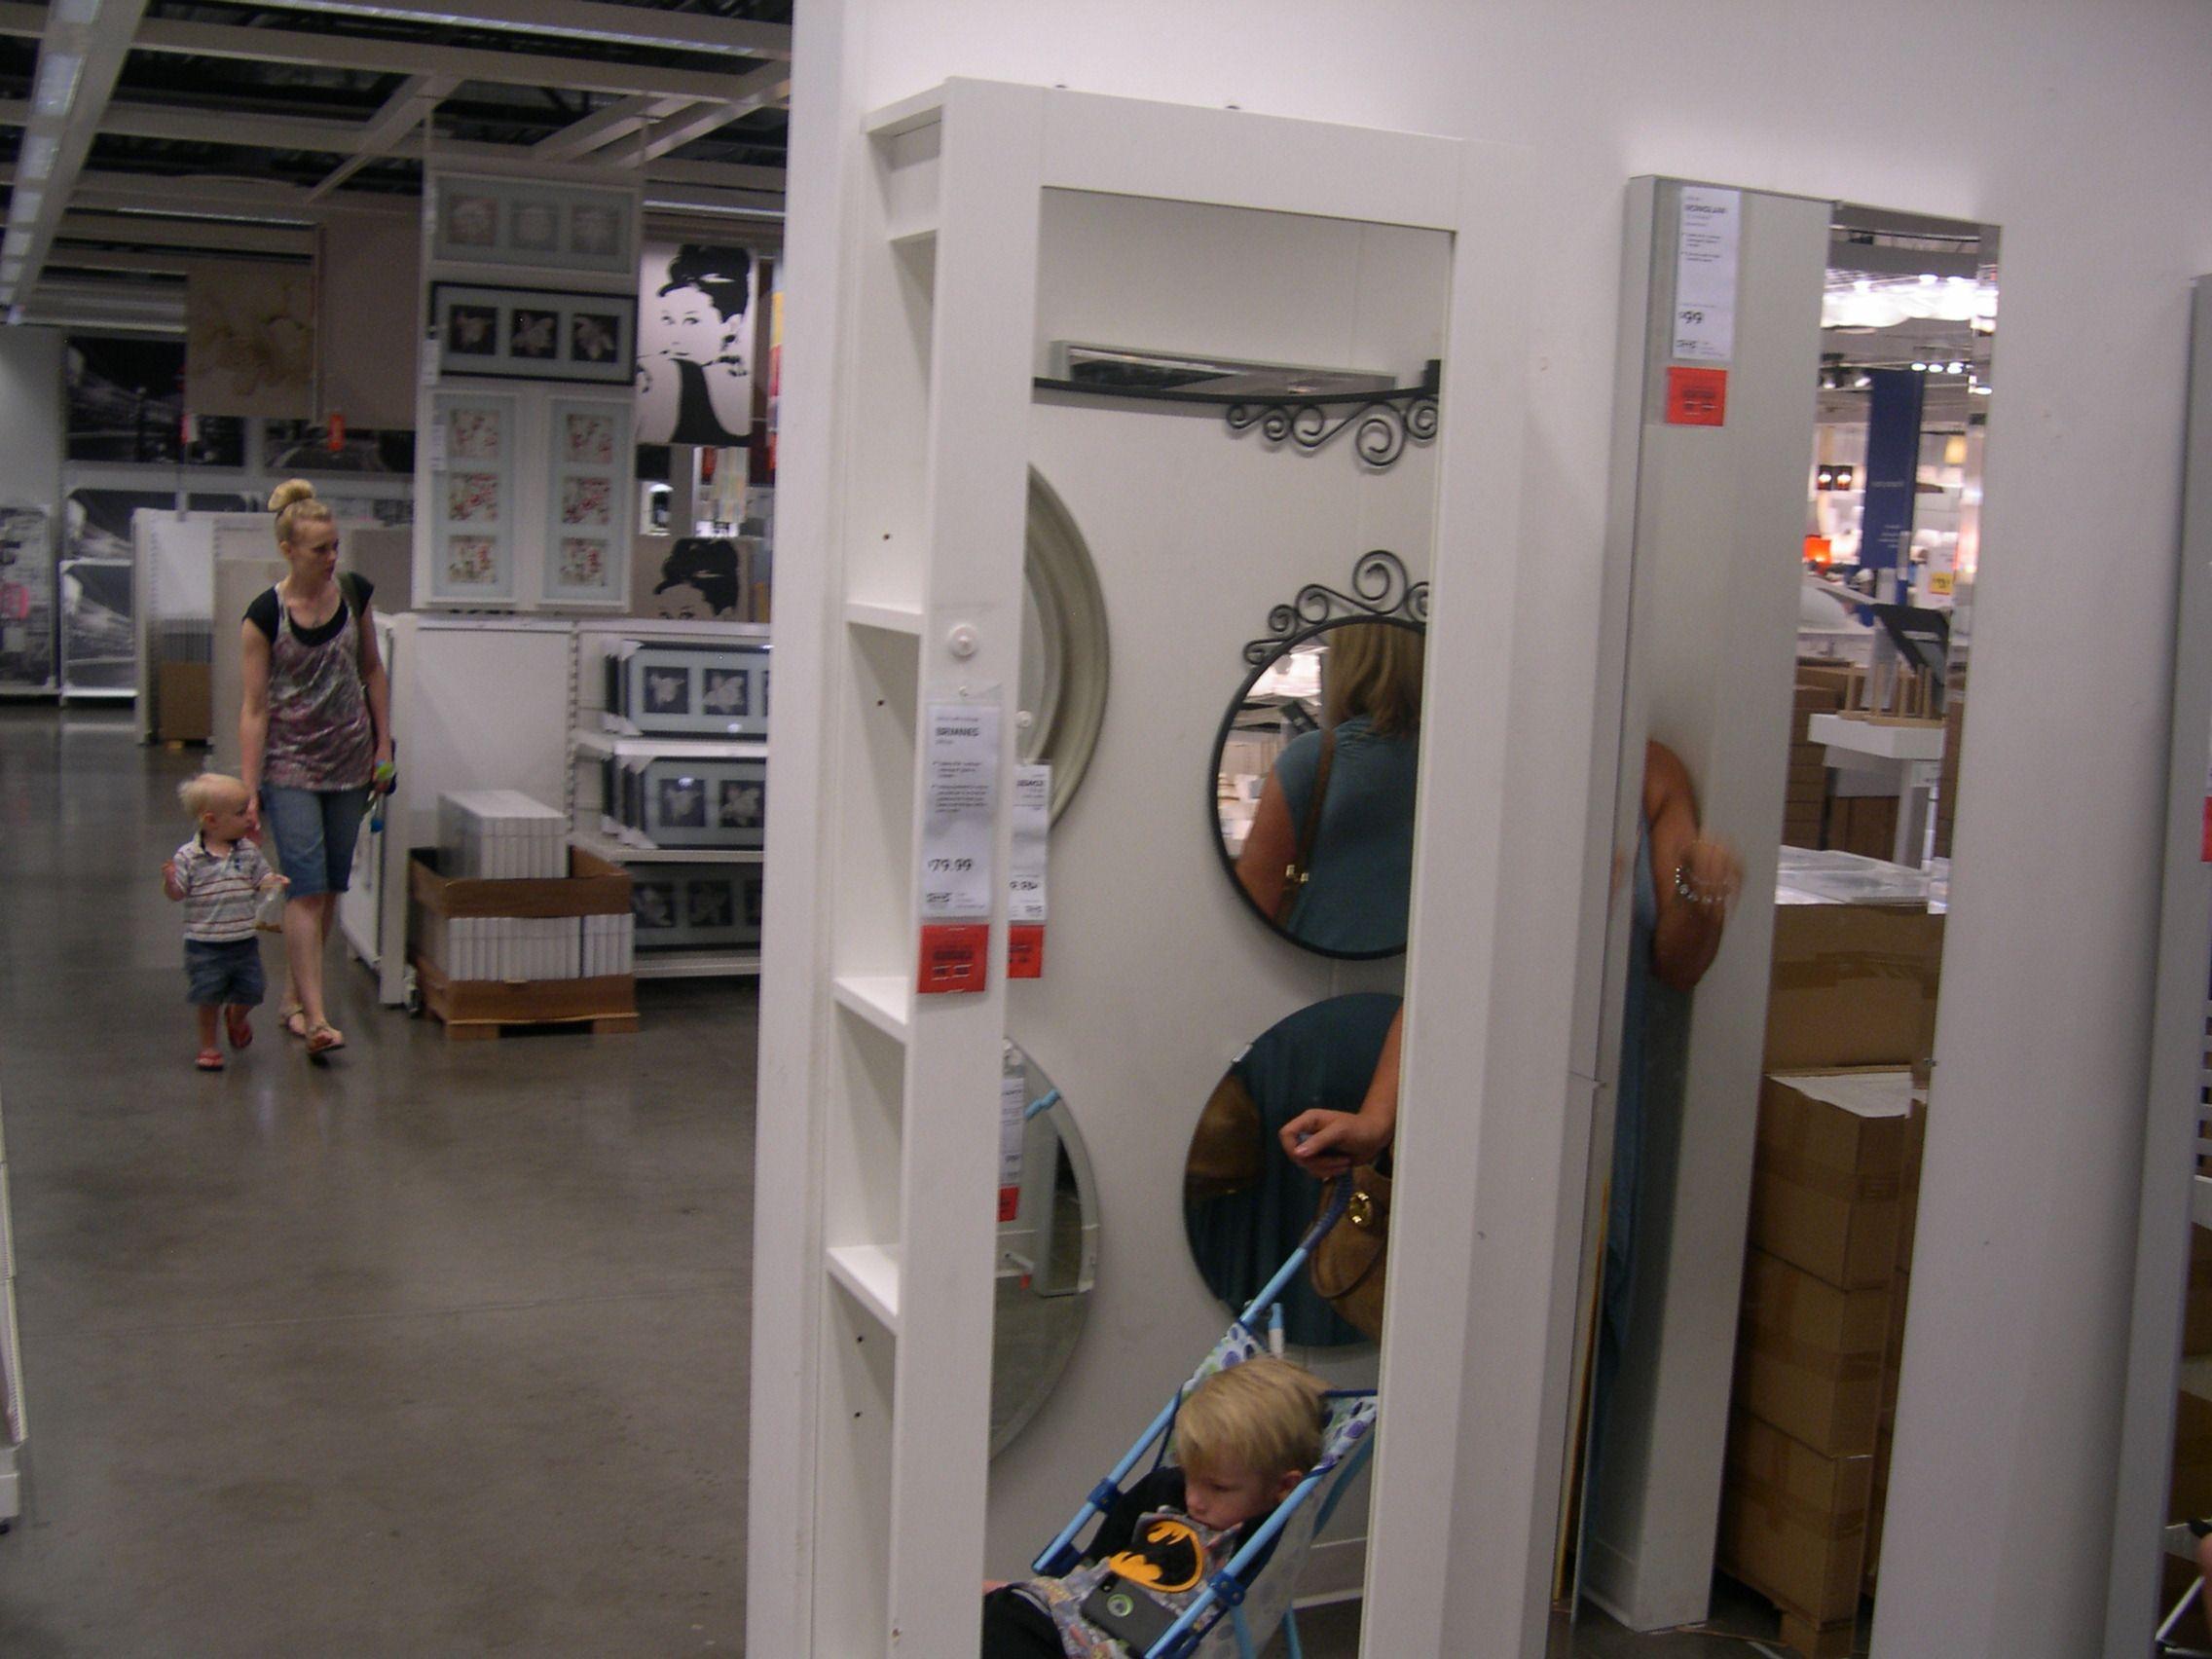 d40005e19200e8e13ad9ec3c725fe142 Frais De Bar De Salon Ikea Concept